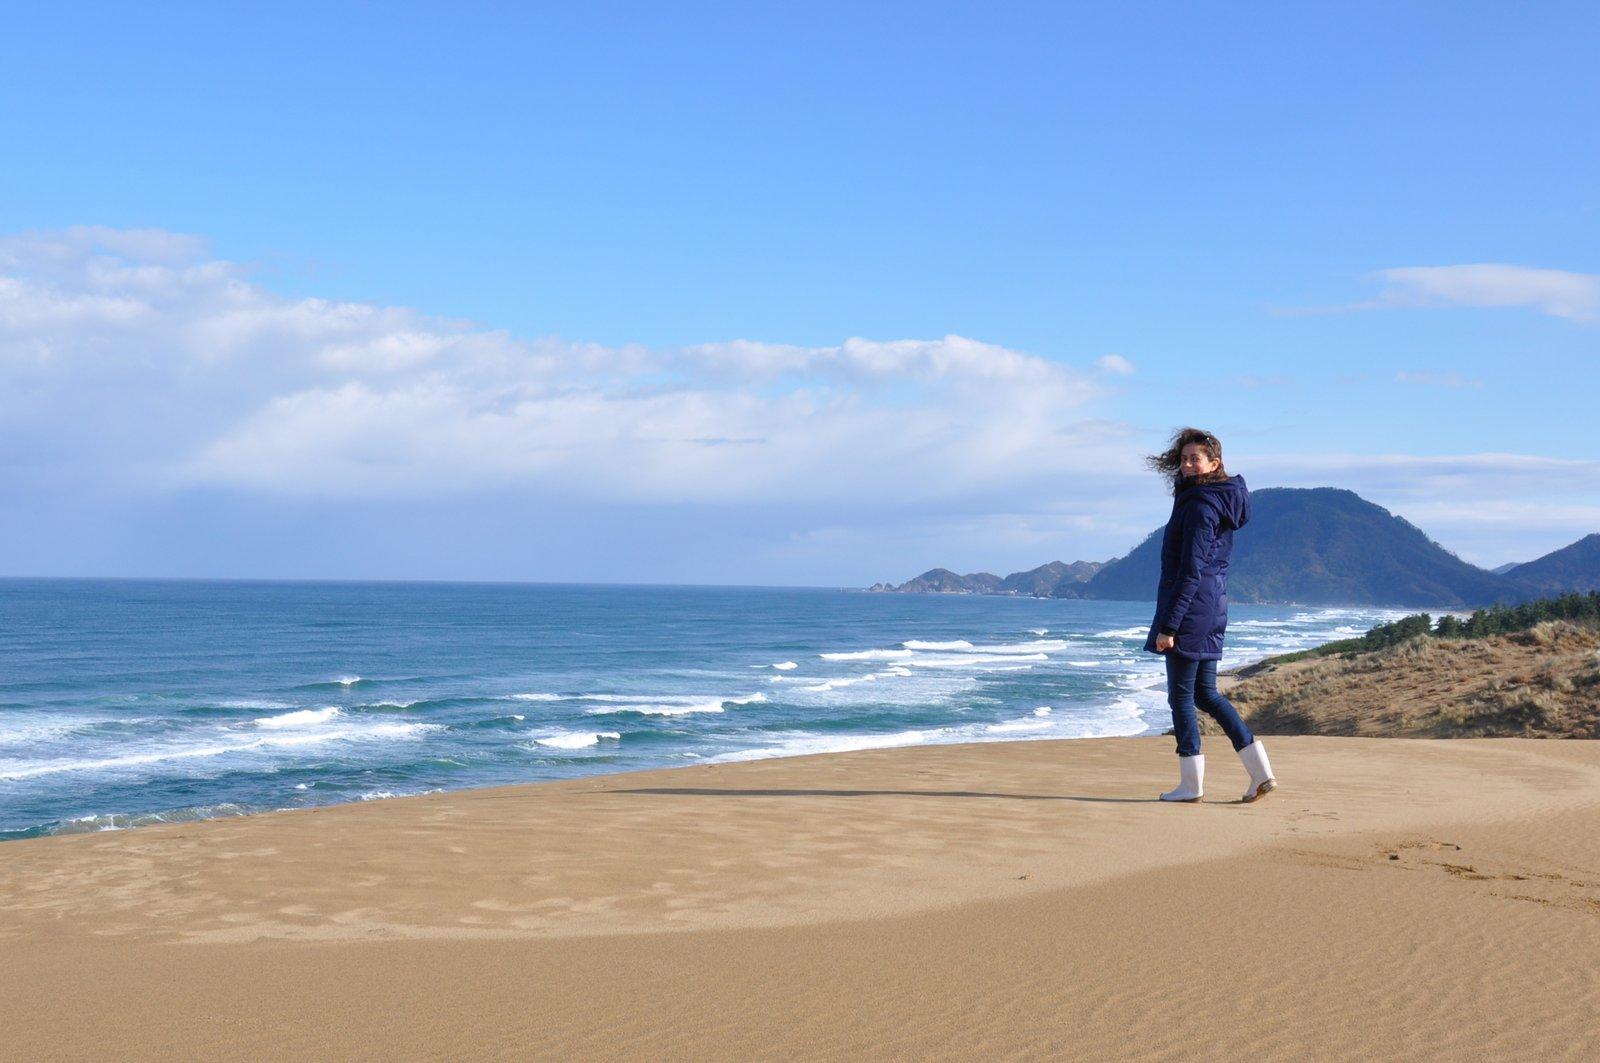 decouvrir-tottori-voyage-japon